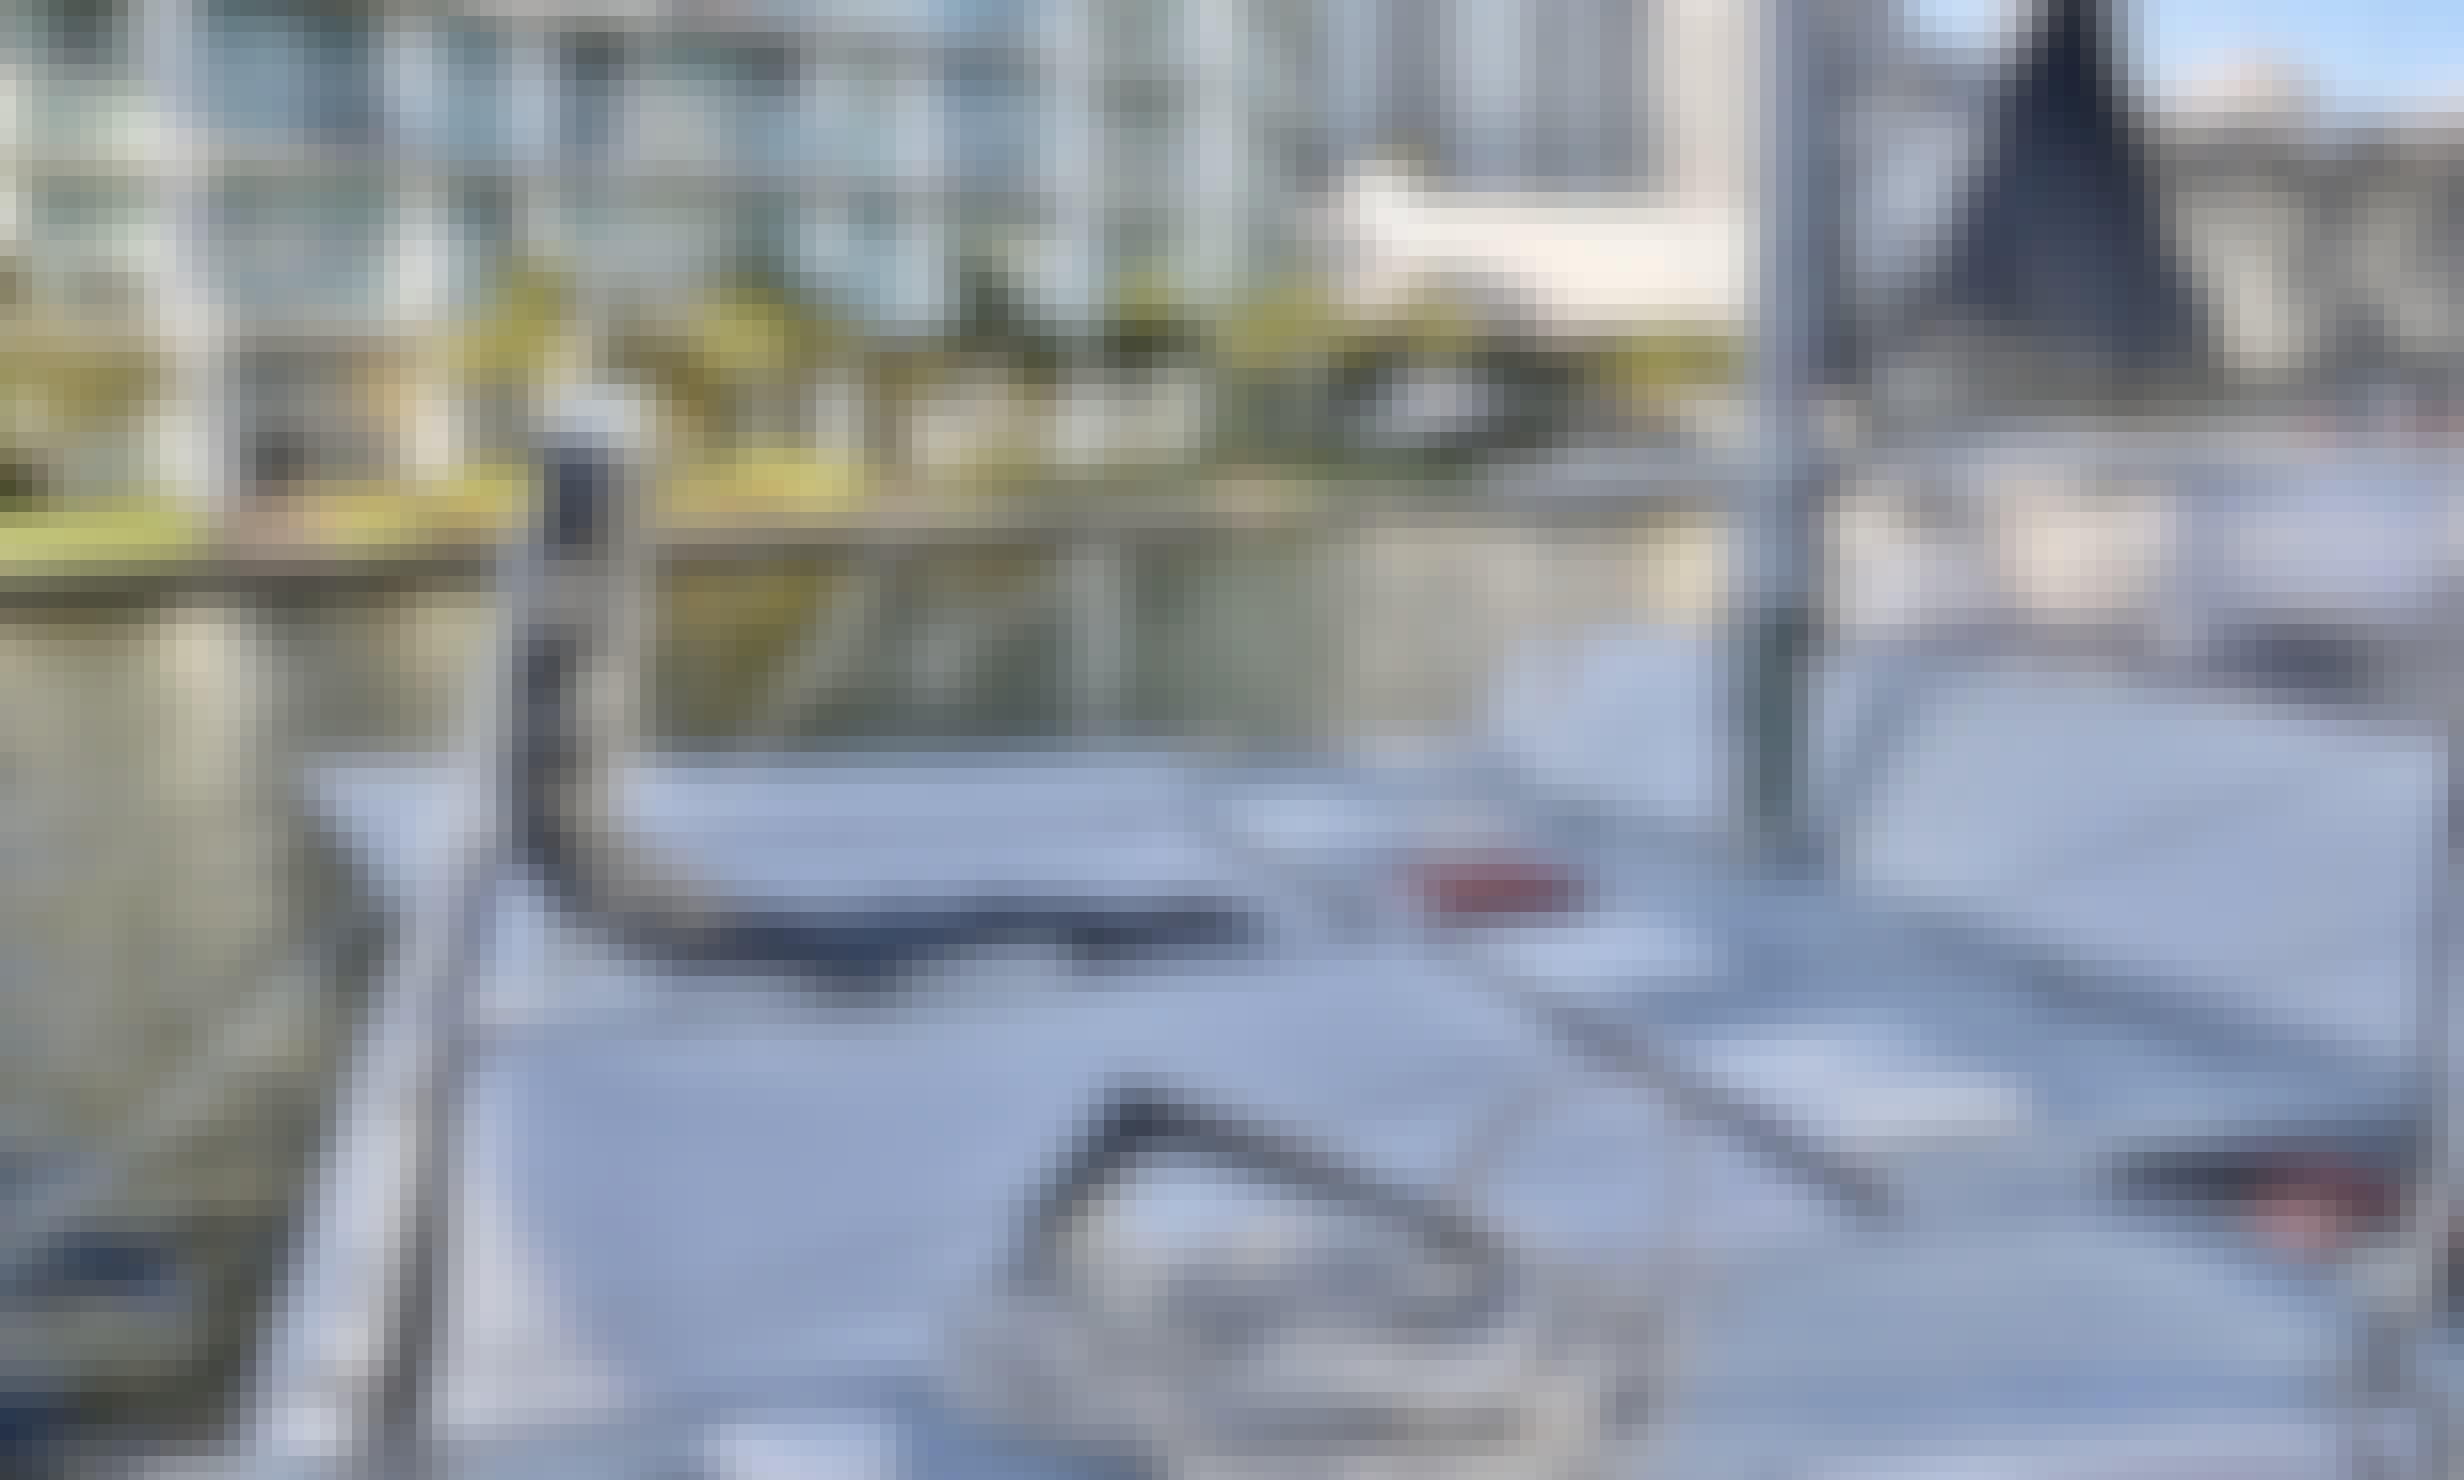 55' Sailing Party Catamaran in Miami, Florida. (Min 4 hours)